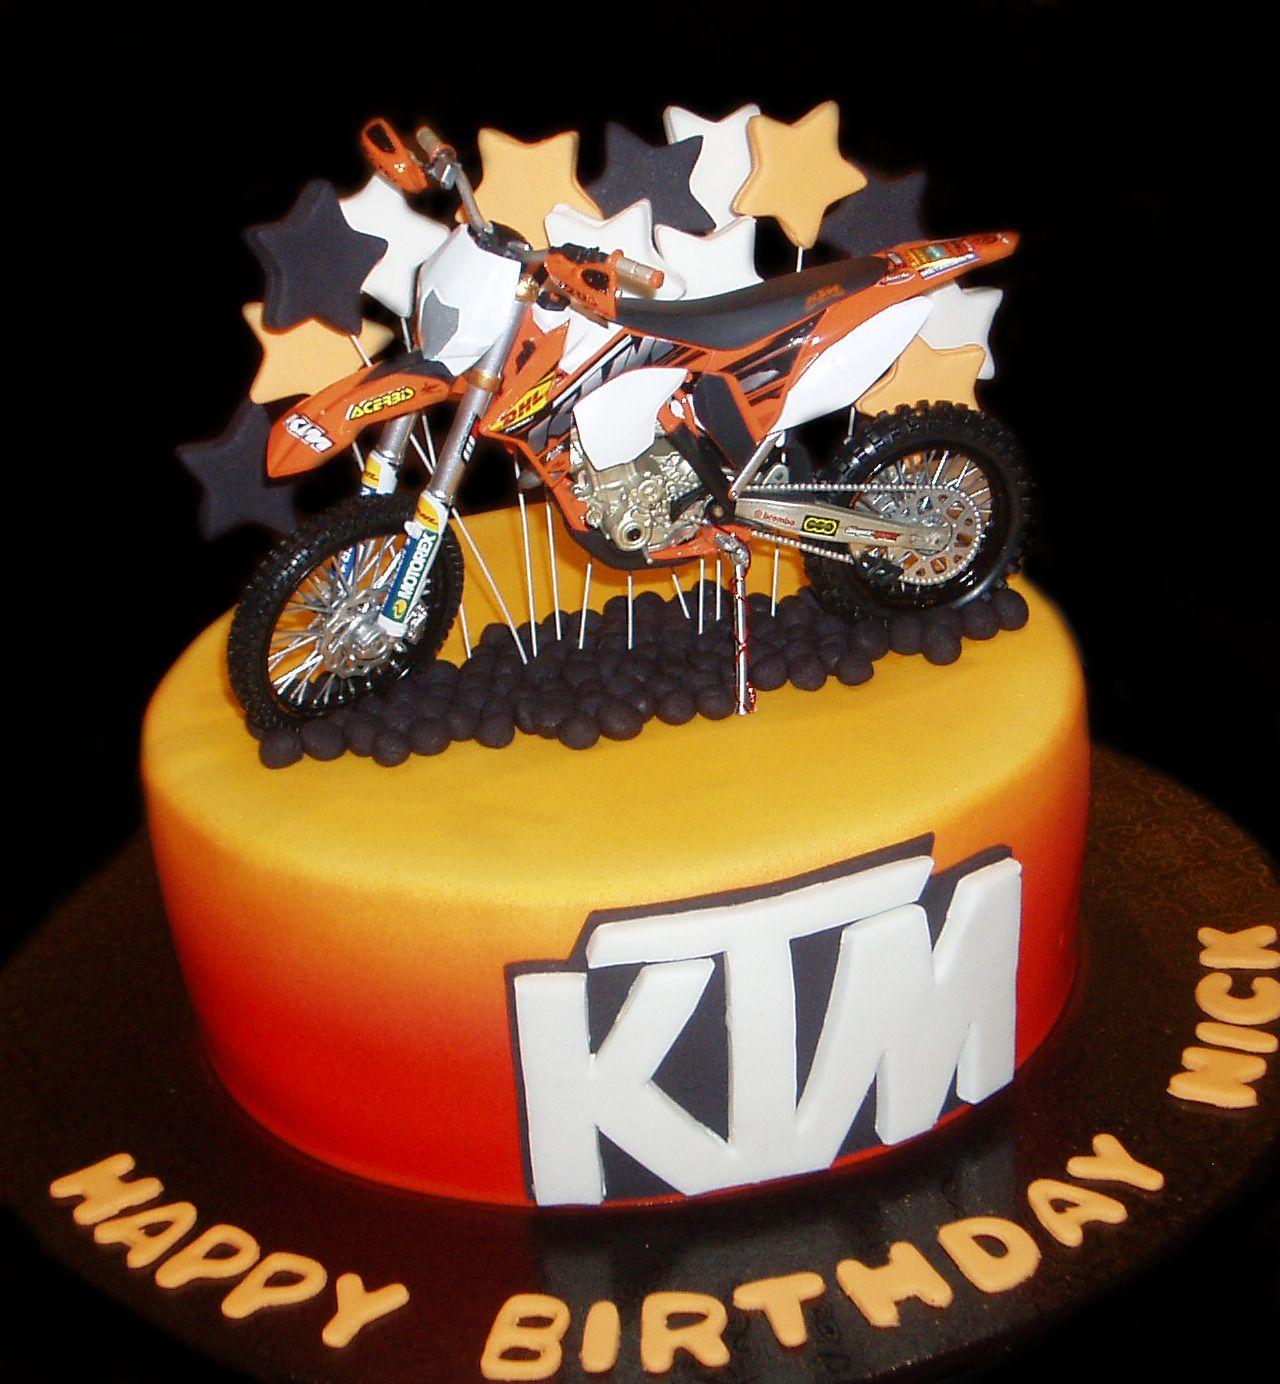 Ktm Motorbike Birthday Cake By Nada S Cakes Canberra